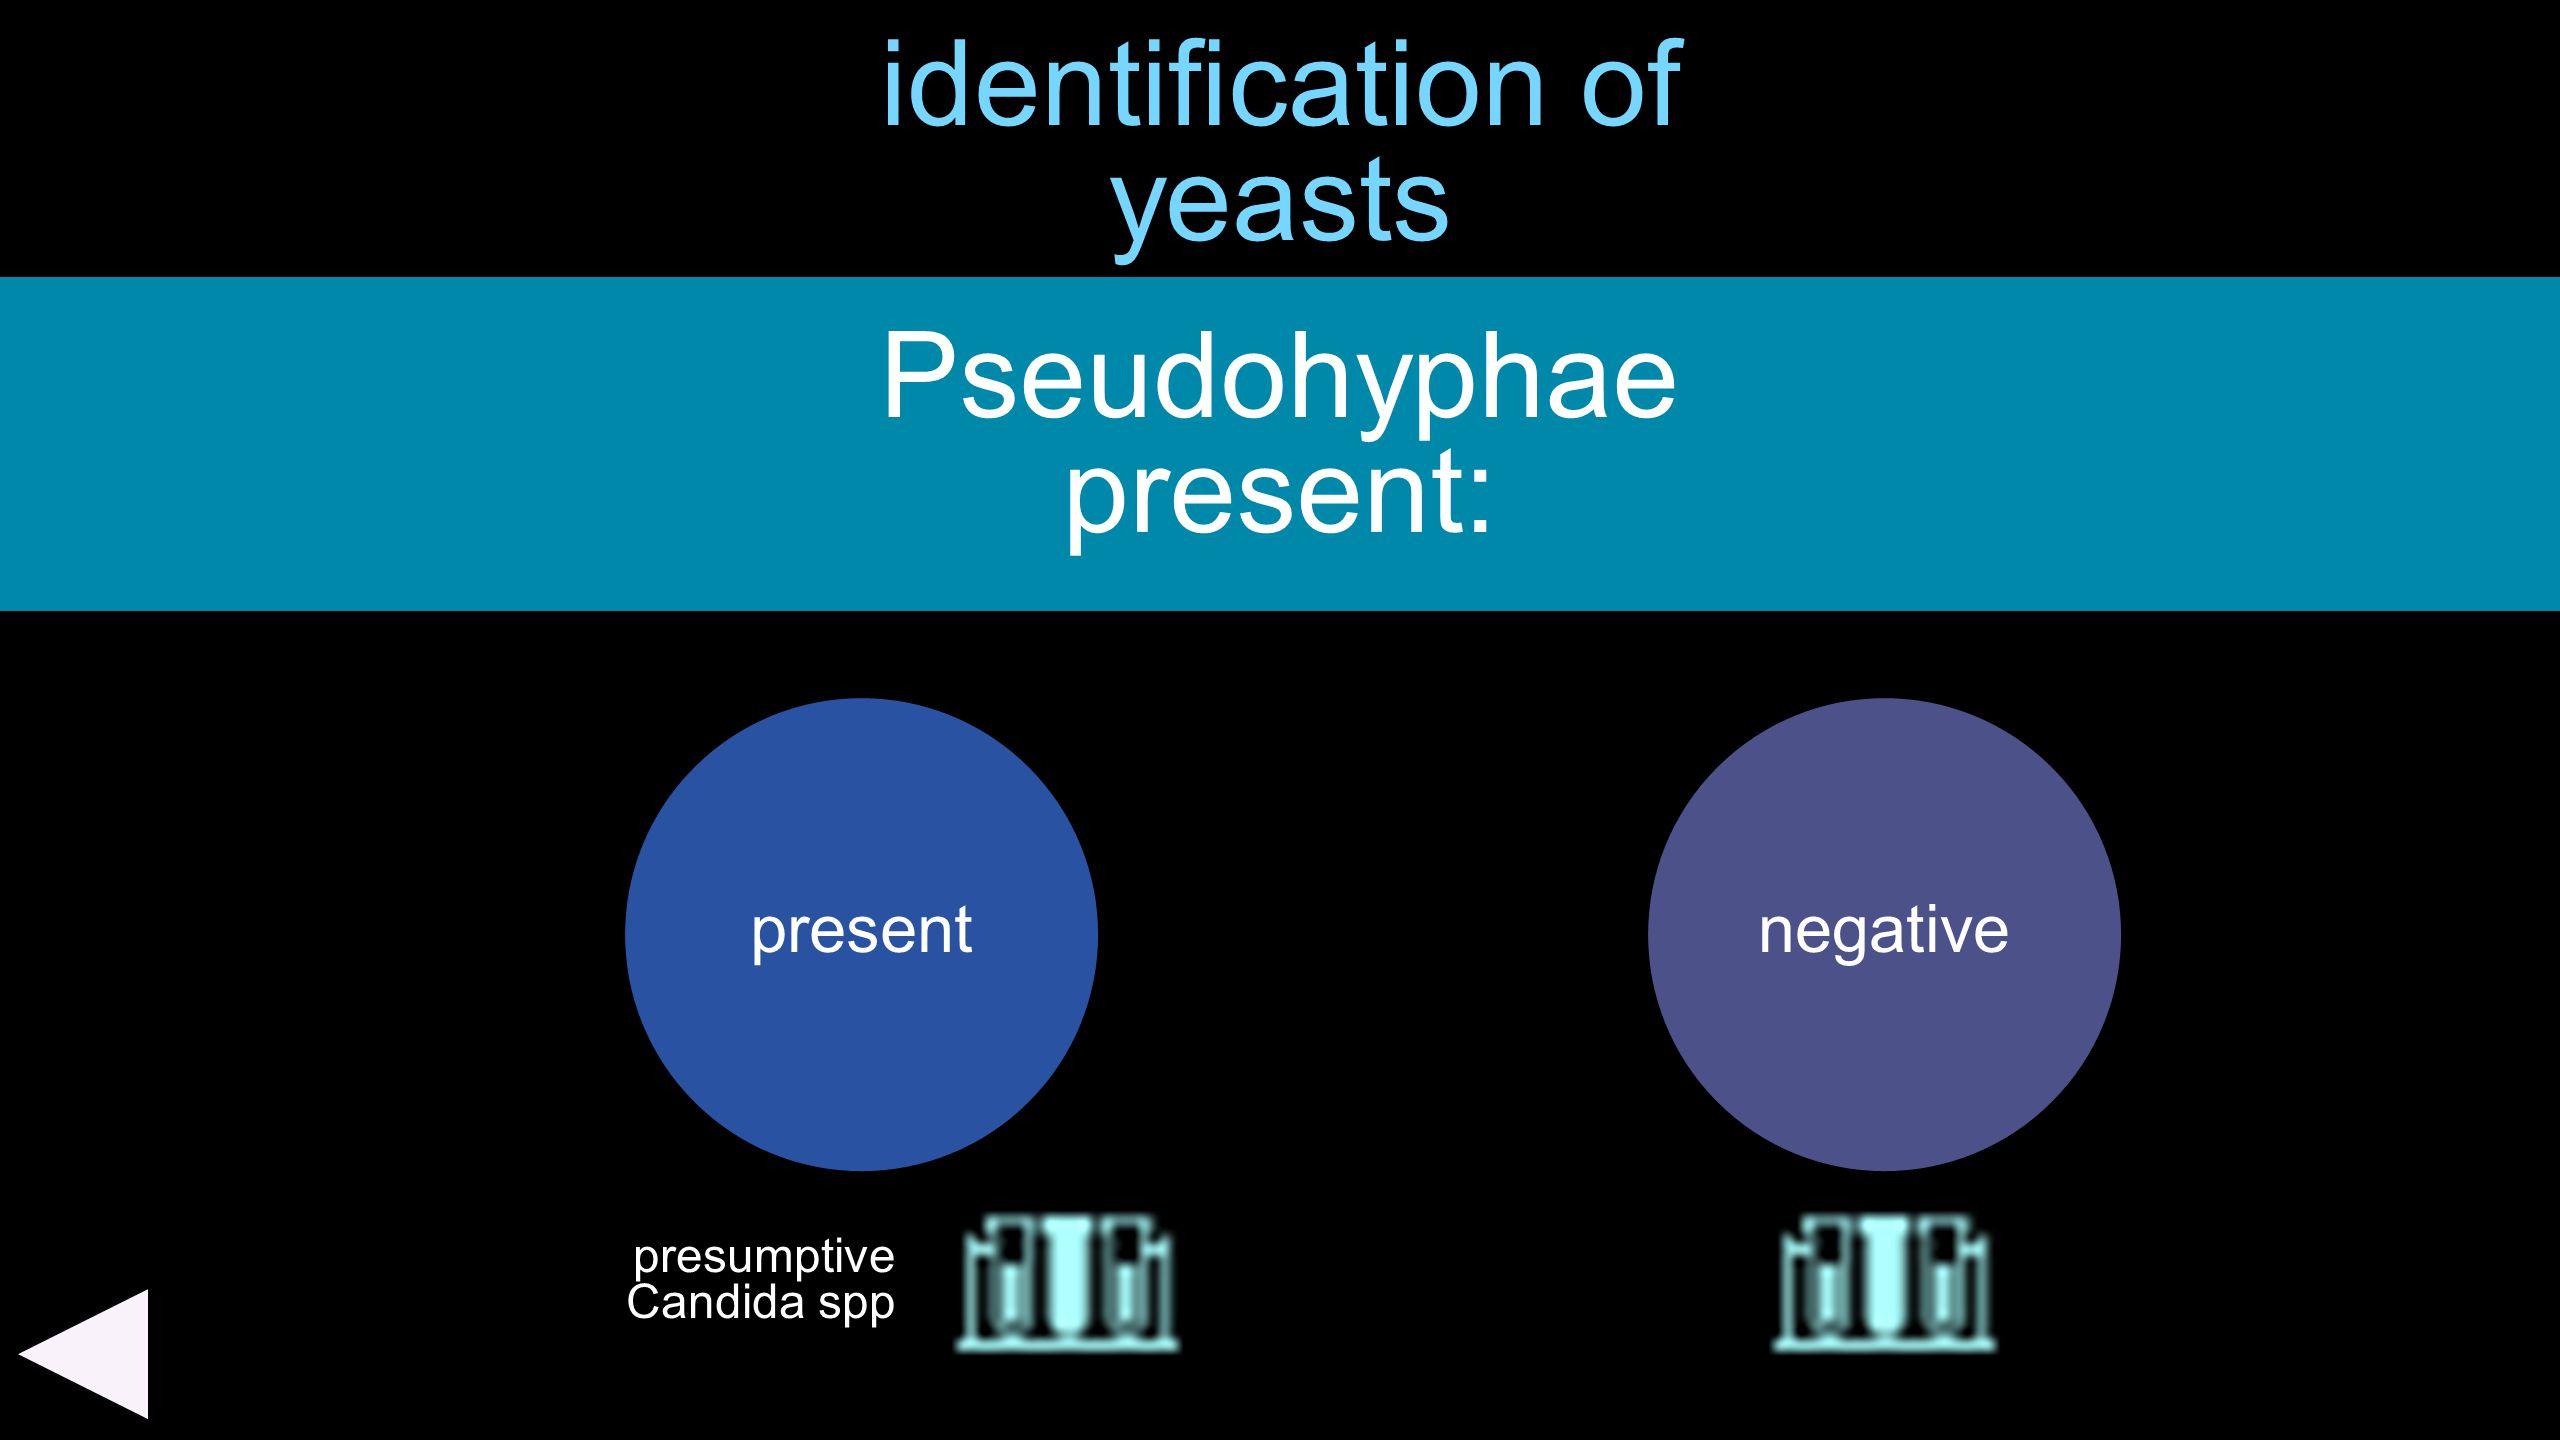 identification of yeasts Pseudohyphae present: presentnegative presumptive Candida spp